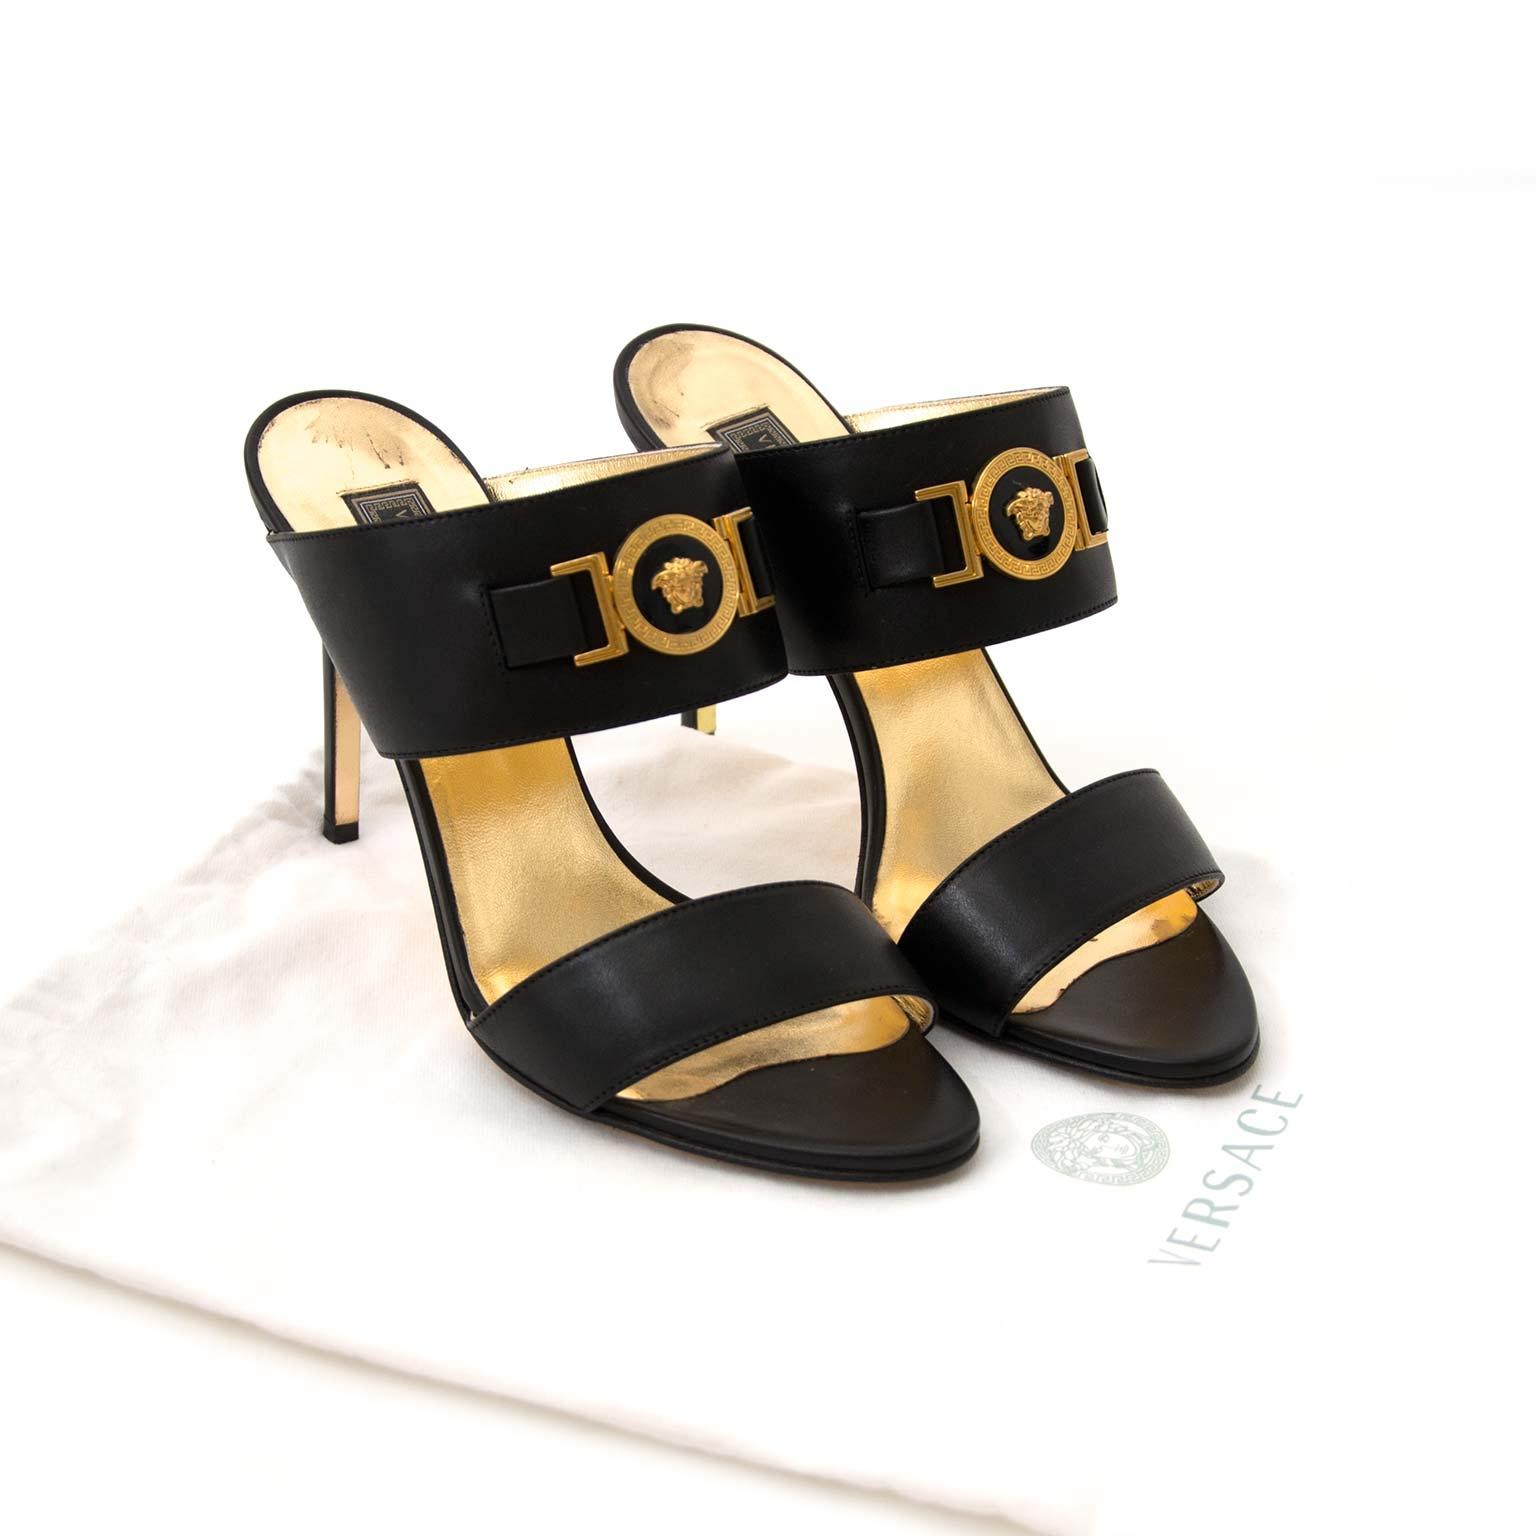 Te koop: Versace Medusa Heeled Sandals